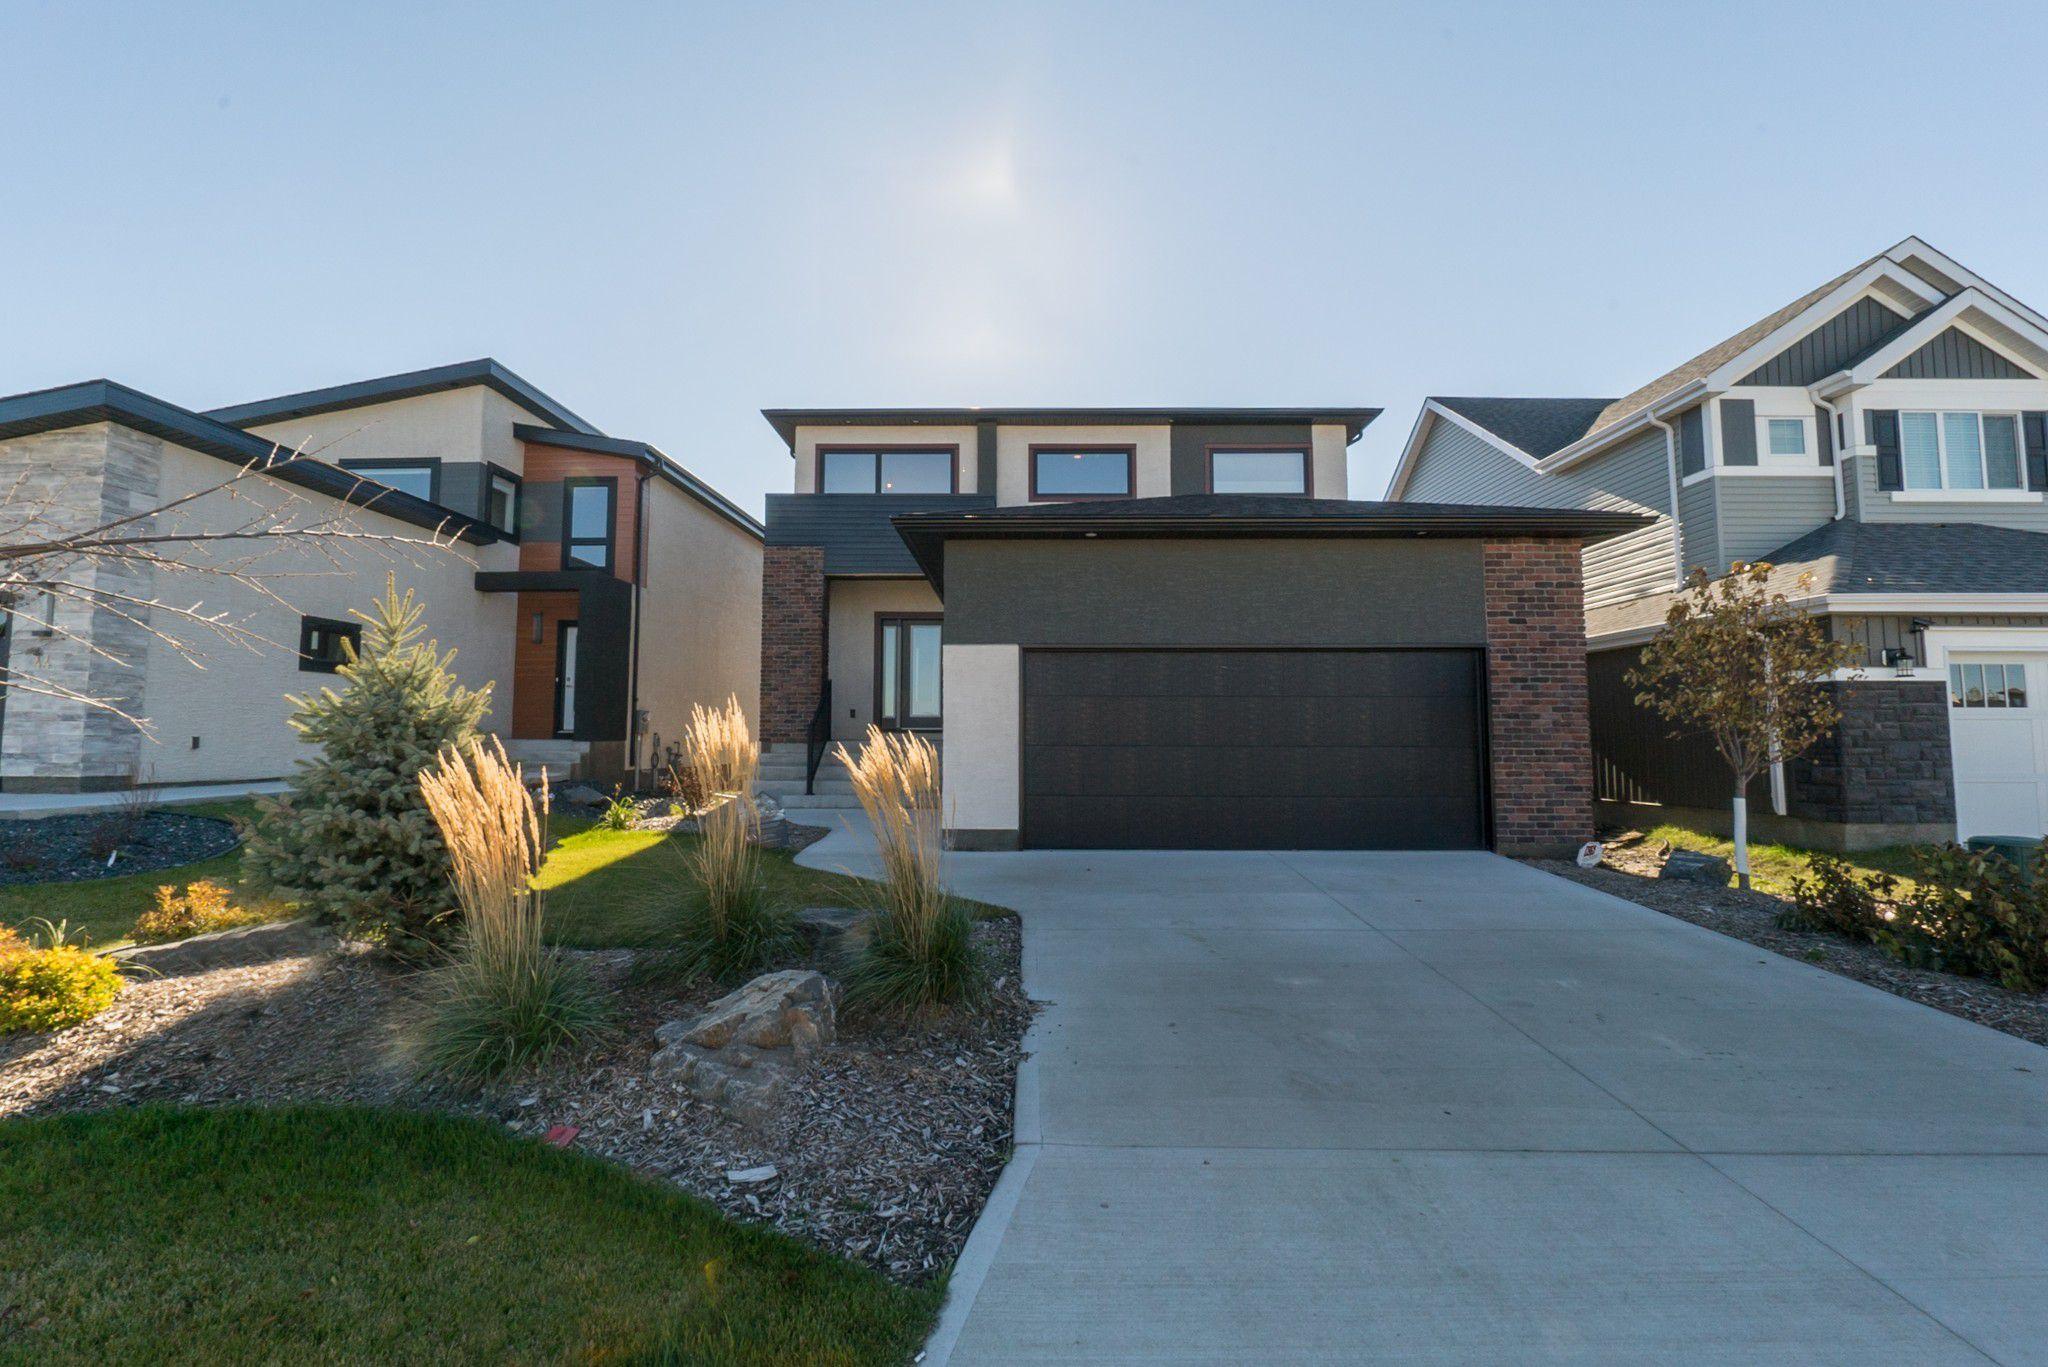 Main Photo: 48 Bow Water Drive in Winnipeg: Bonavista Residential for sale (2J)  : MLS®# 1901346